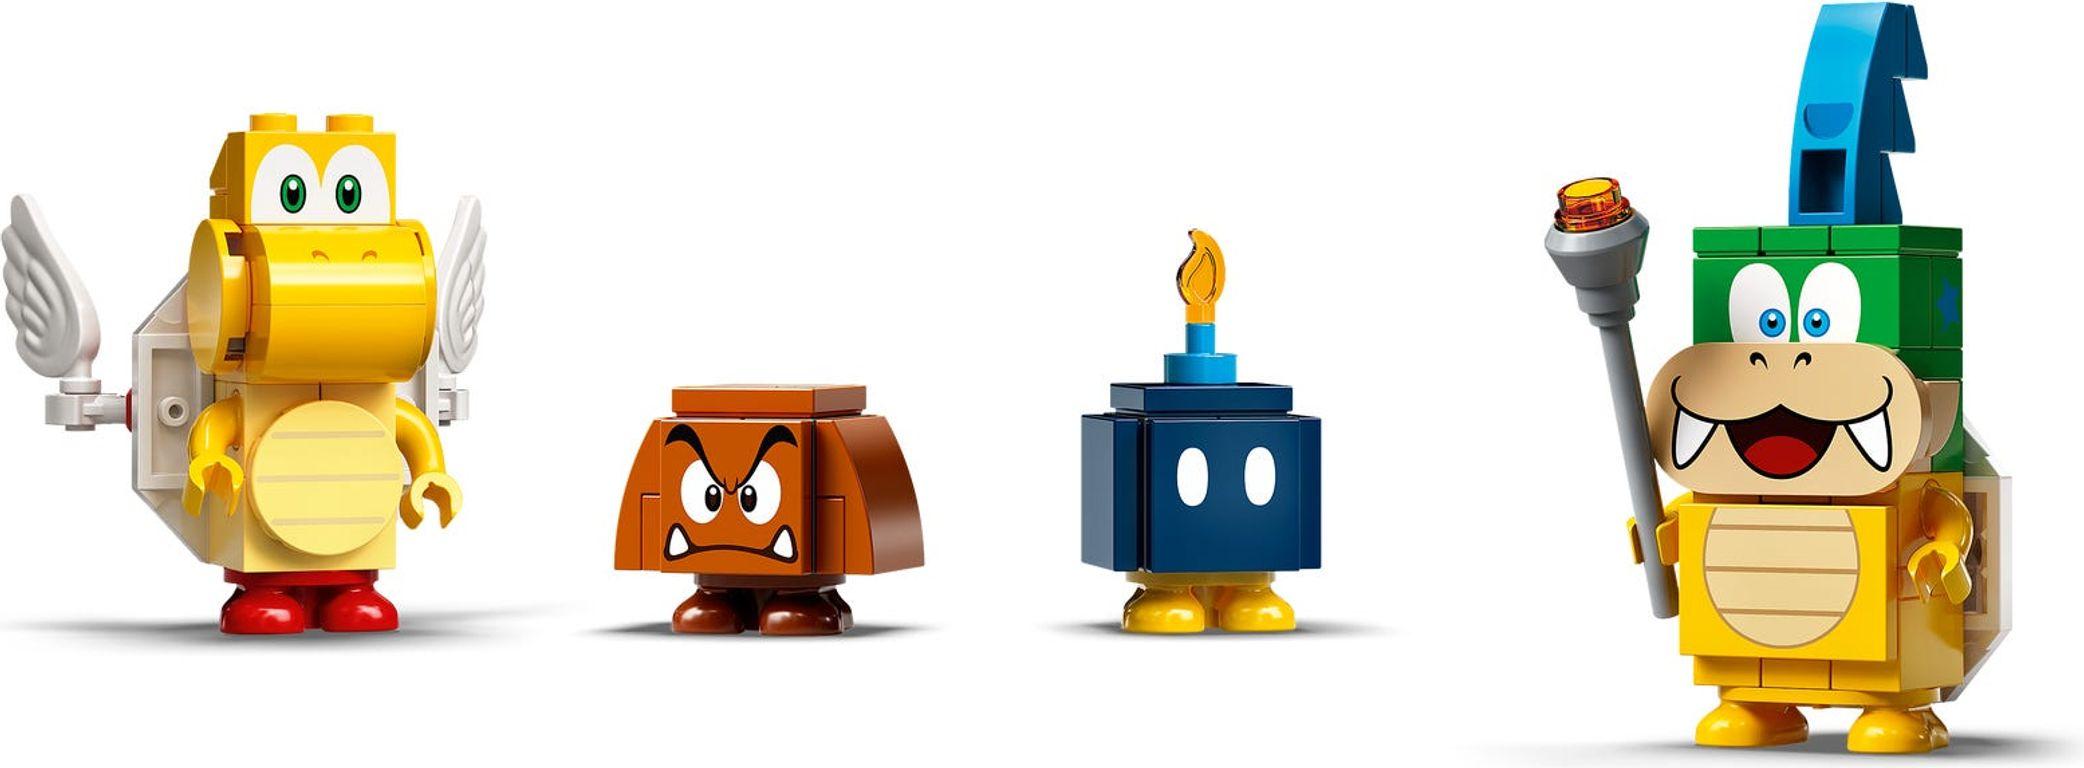 Master Your Adventure Maker Set minifigures